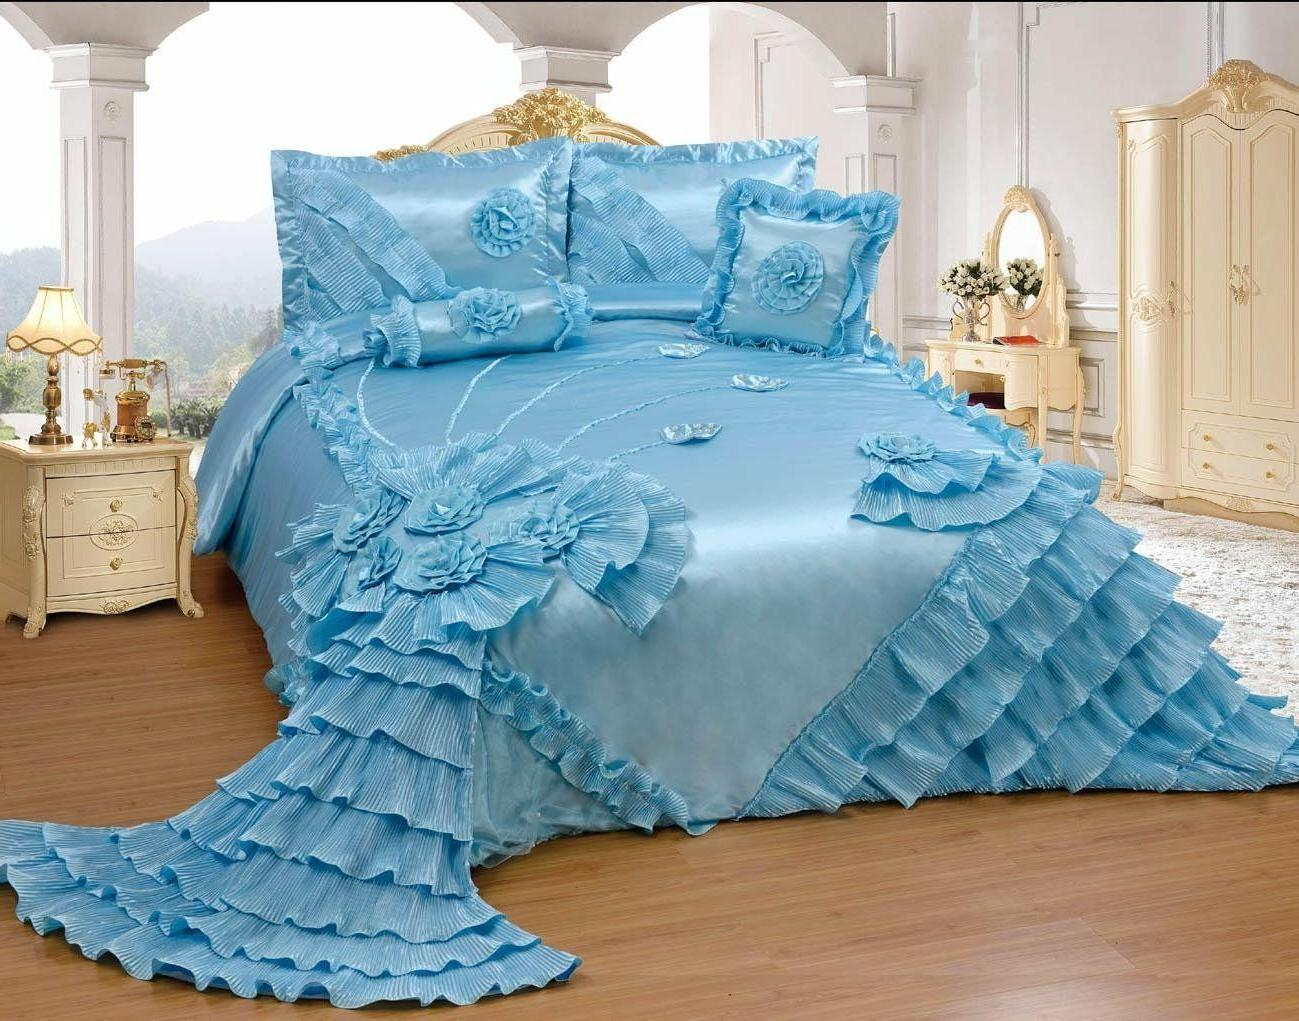 OctoRose Bedspread Set or SKIRT or PILLOWCASES